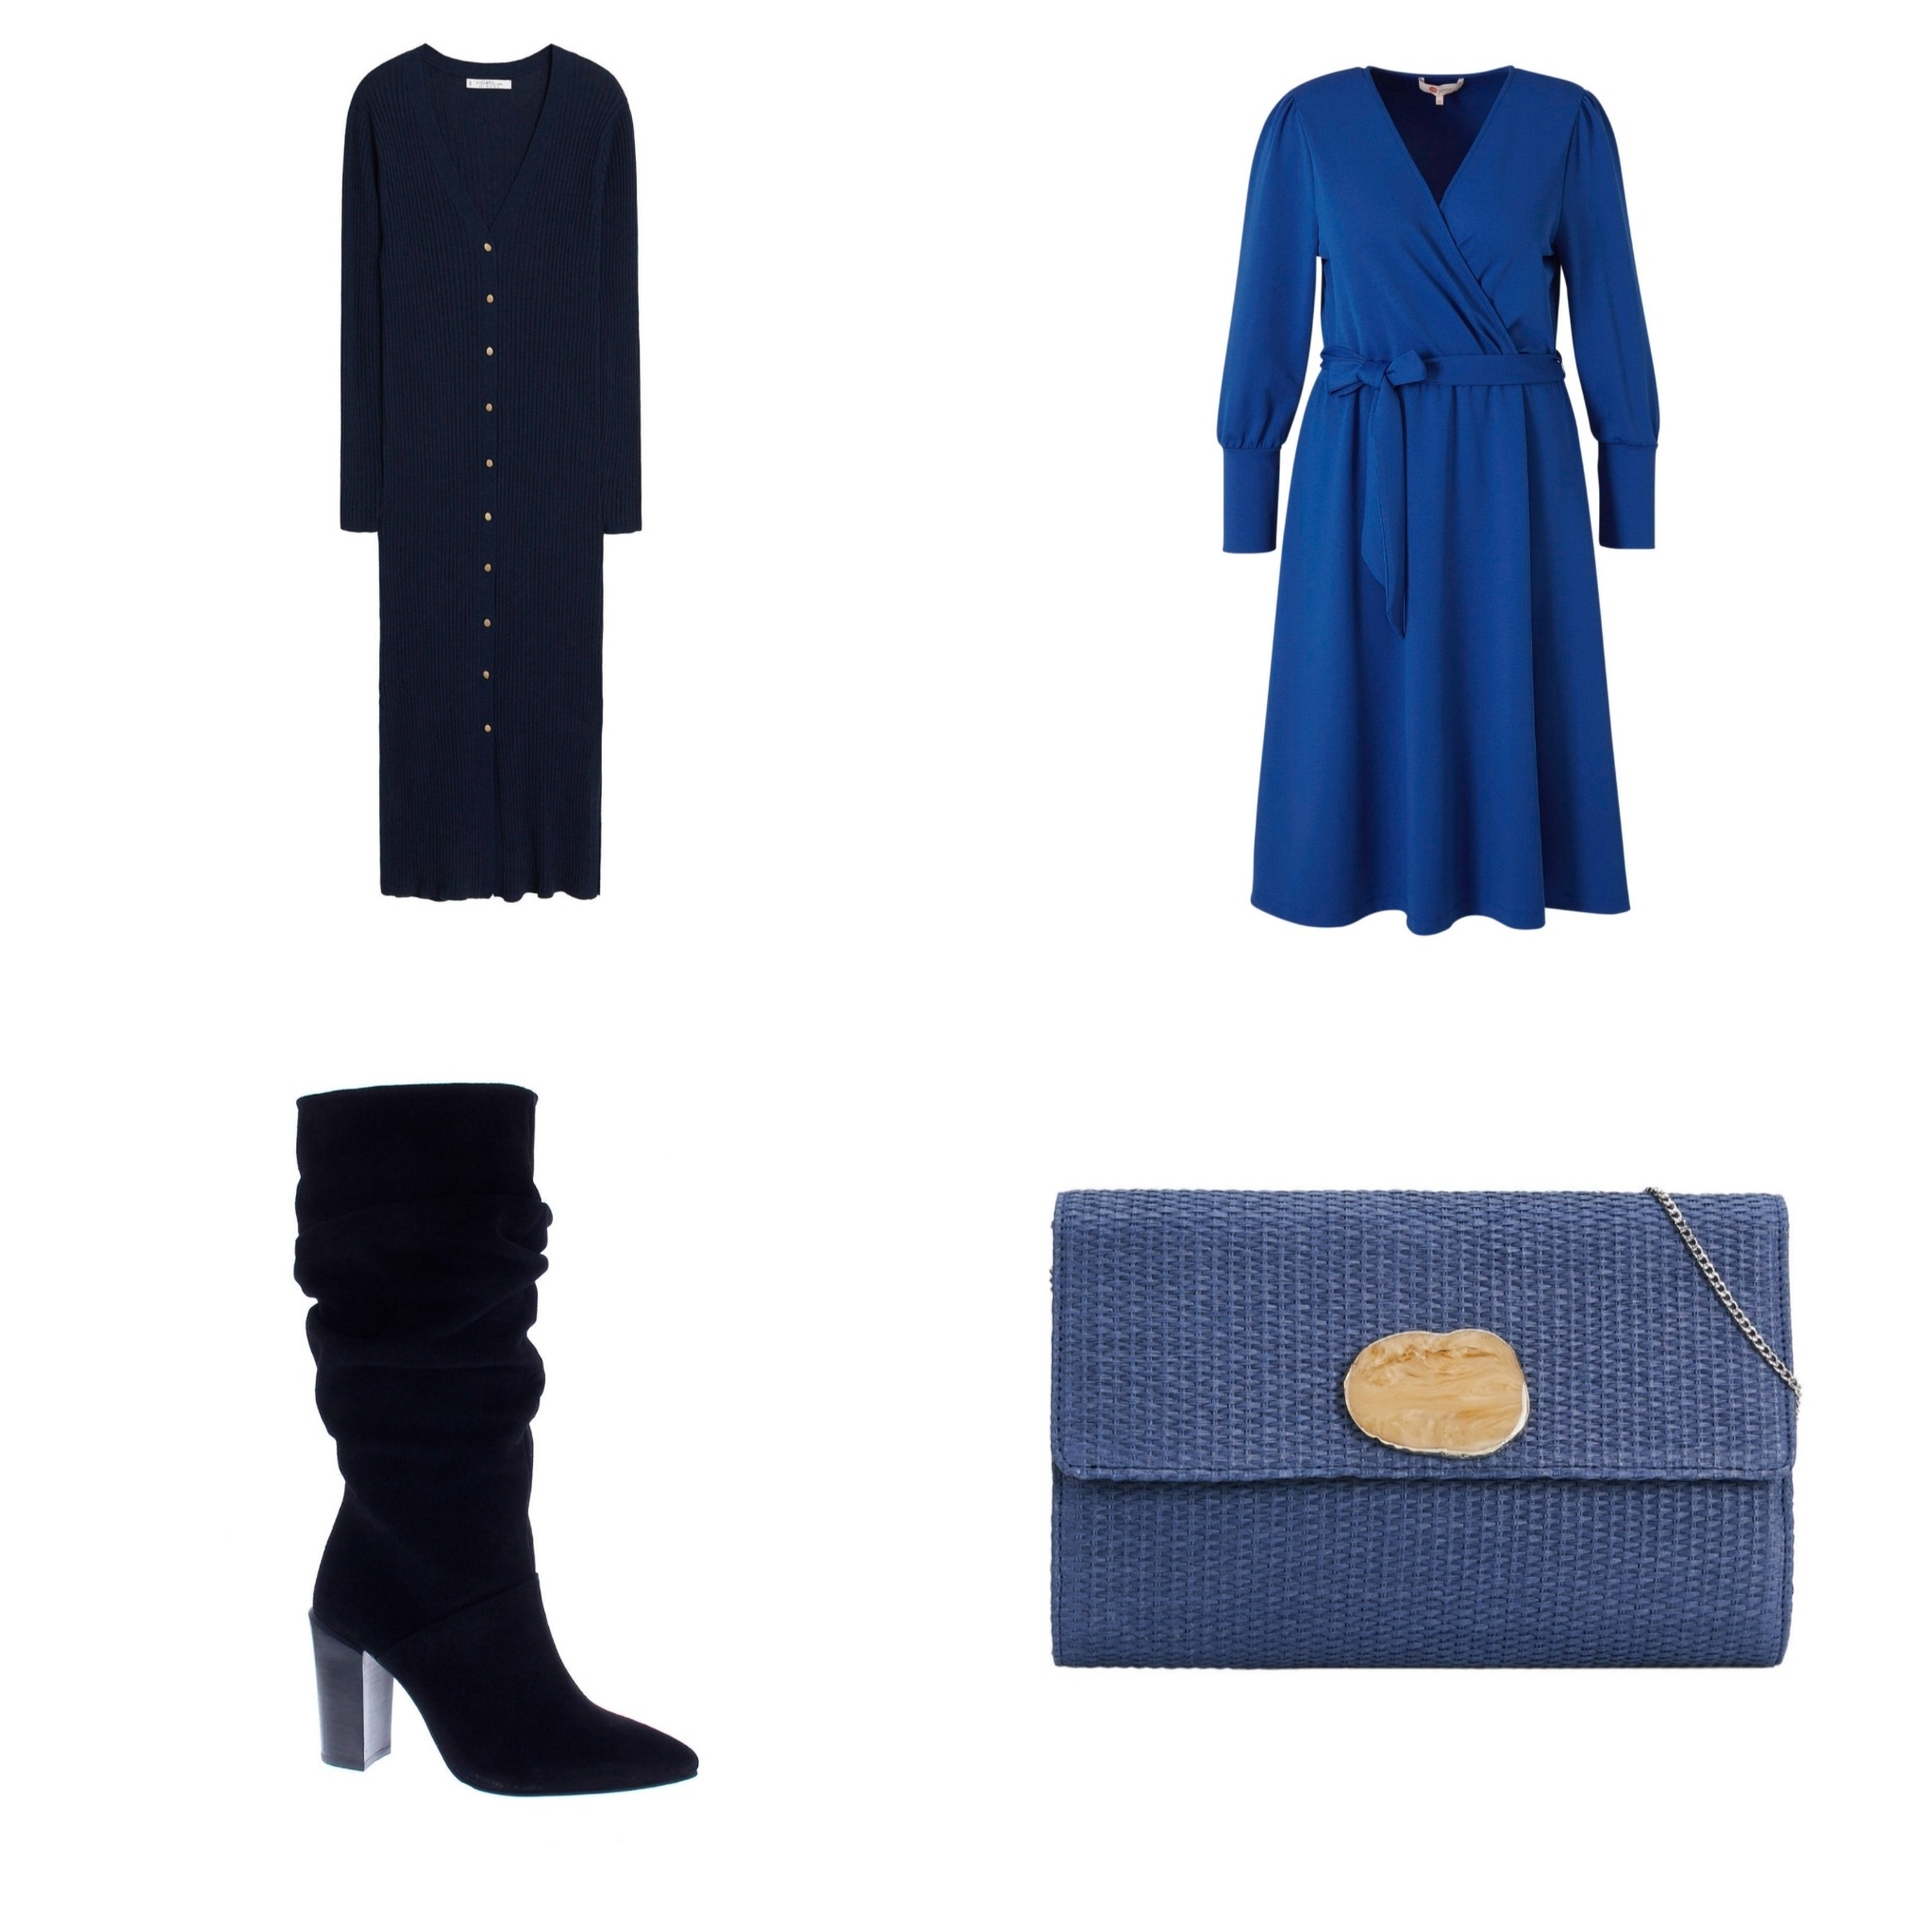 Plus Size Fashion Friday || It's a blue feeling